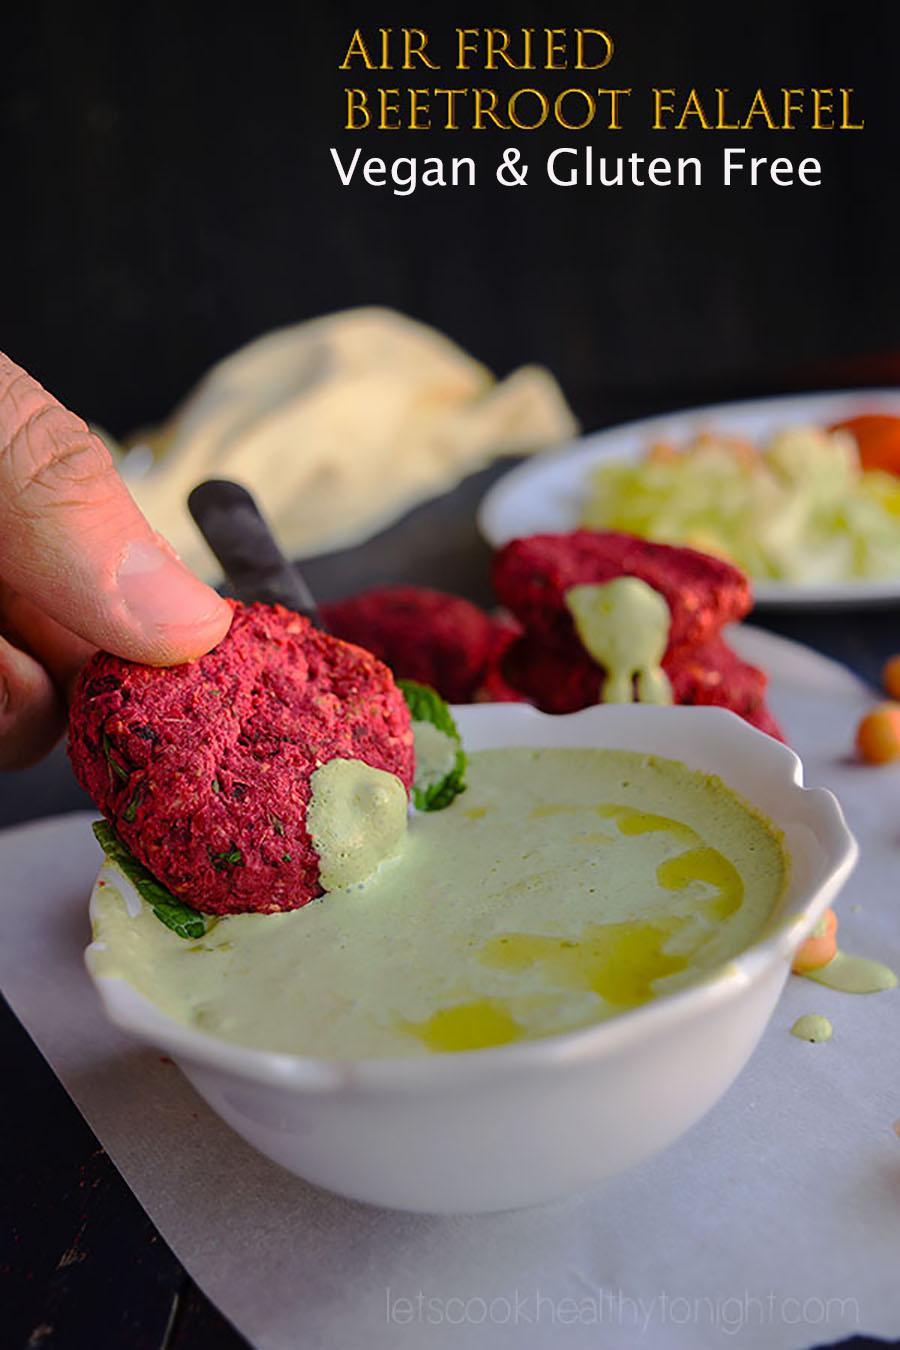 Air Fried Beetroot Falafel- Gluten-free and Vegan